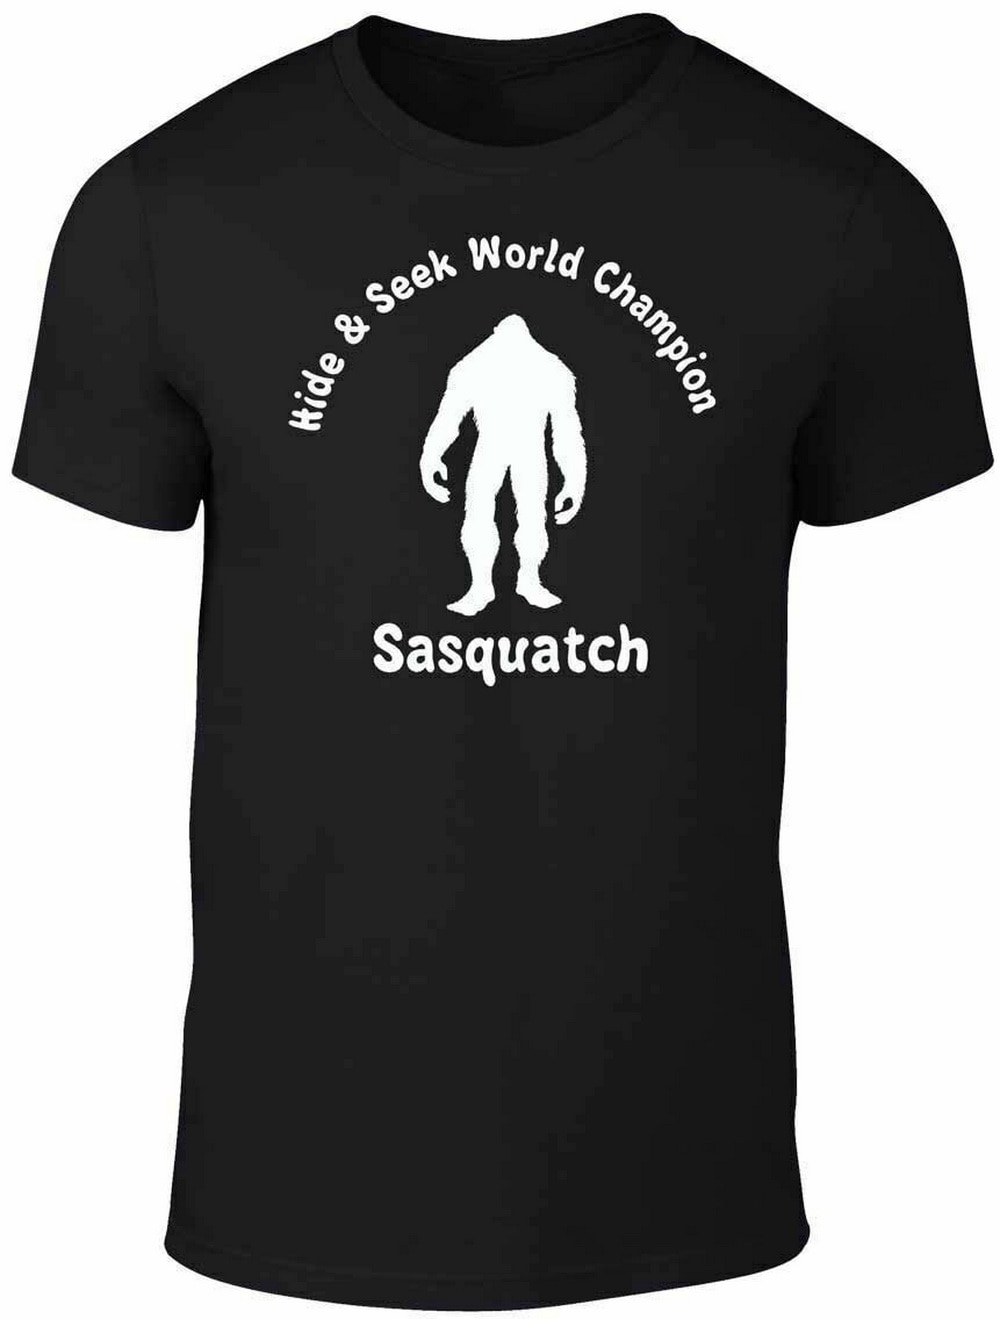 Sasquatch Hide & Seek Champ Tops camiseta divertida bigfoot monstruo cómic leyenda Unisex hombres mujeres camiseta